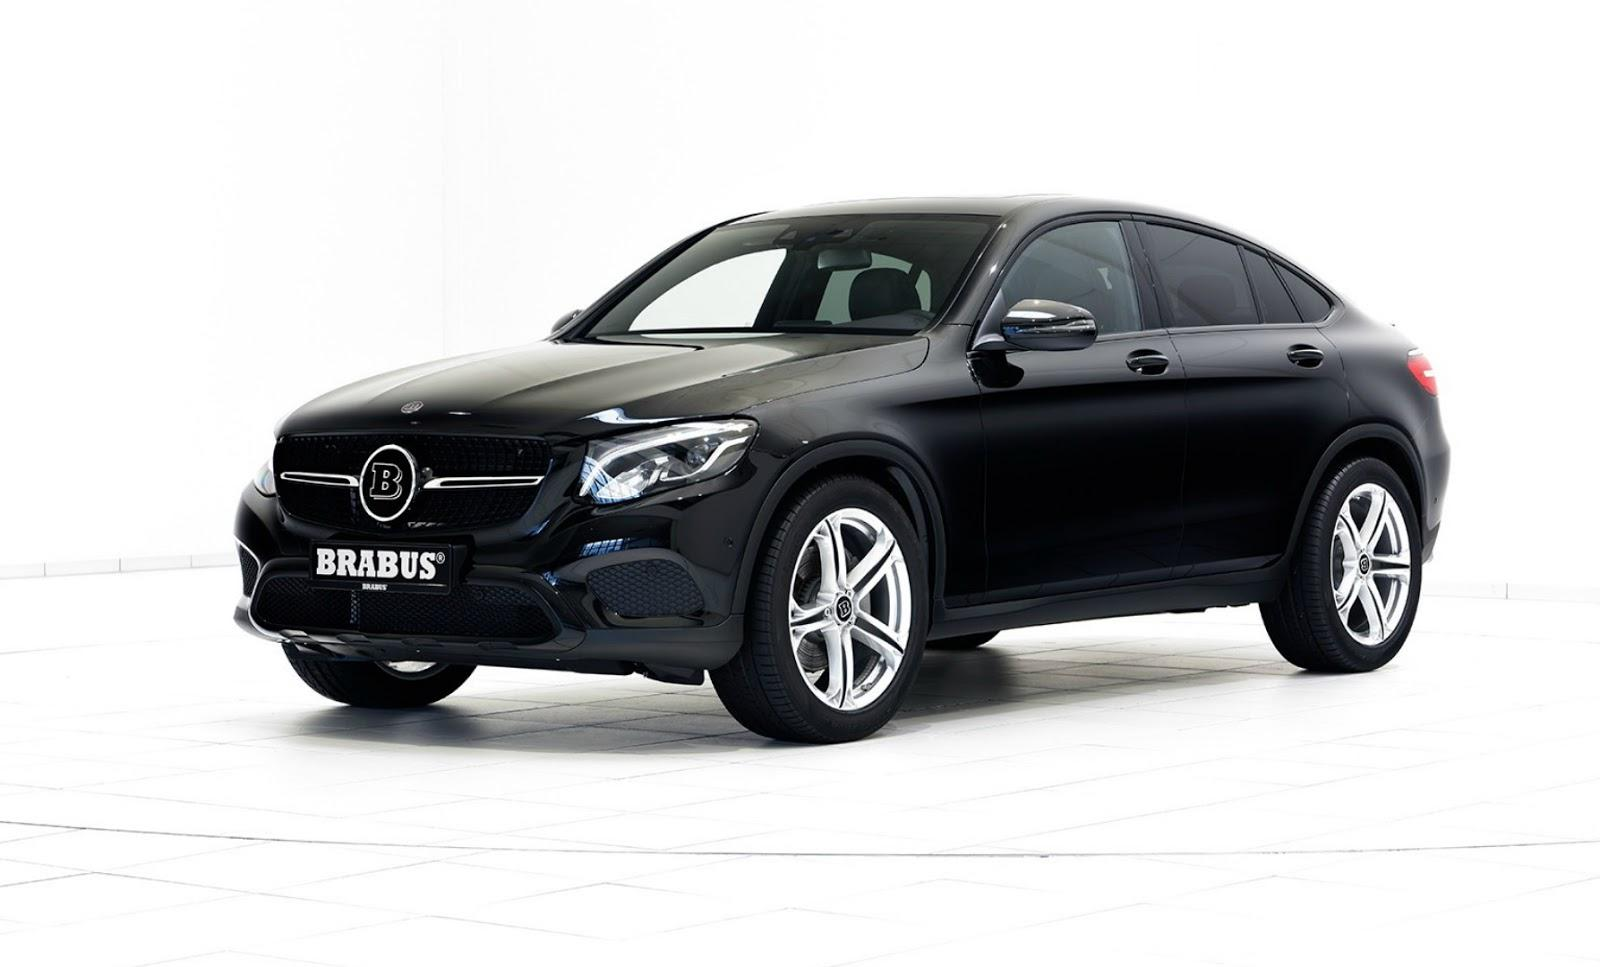 Mercedes-Benz GLC si GLC Coupe by Brabus - Mercedes-Benz GLC si GLC Coupe by Brabus